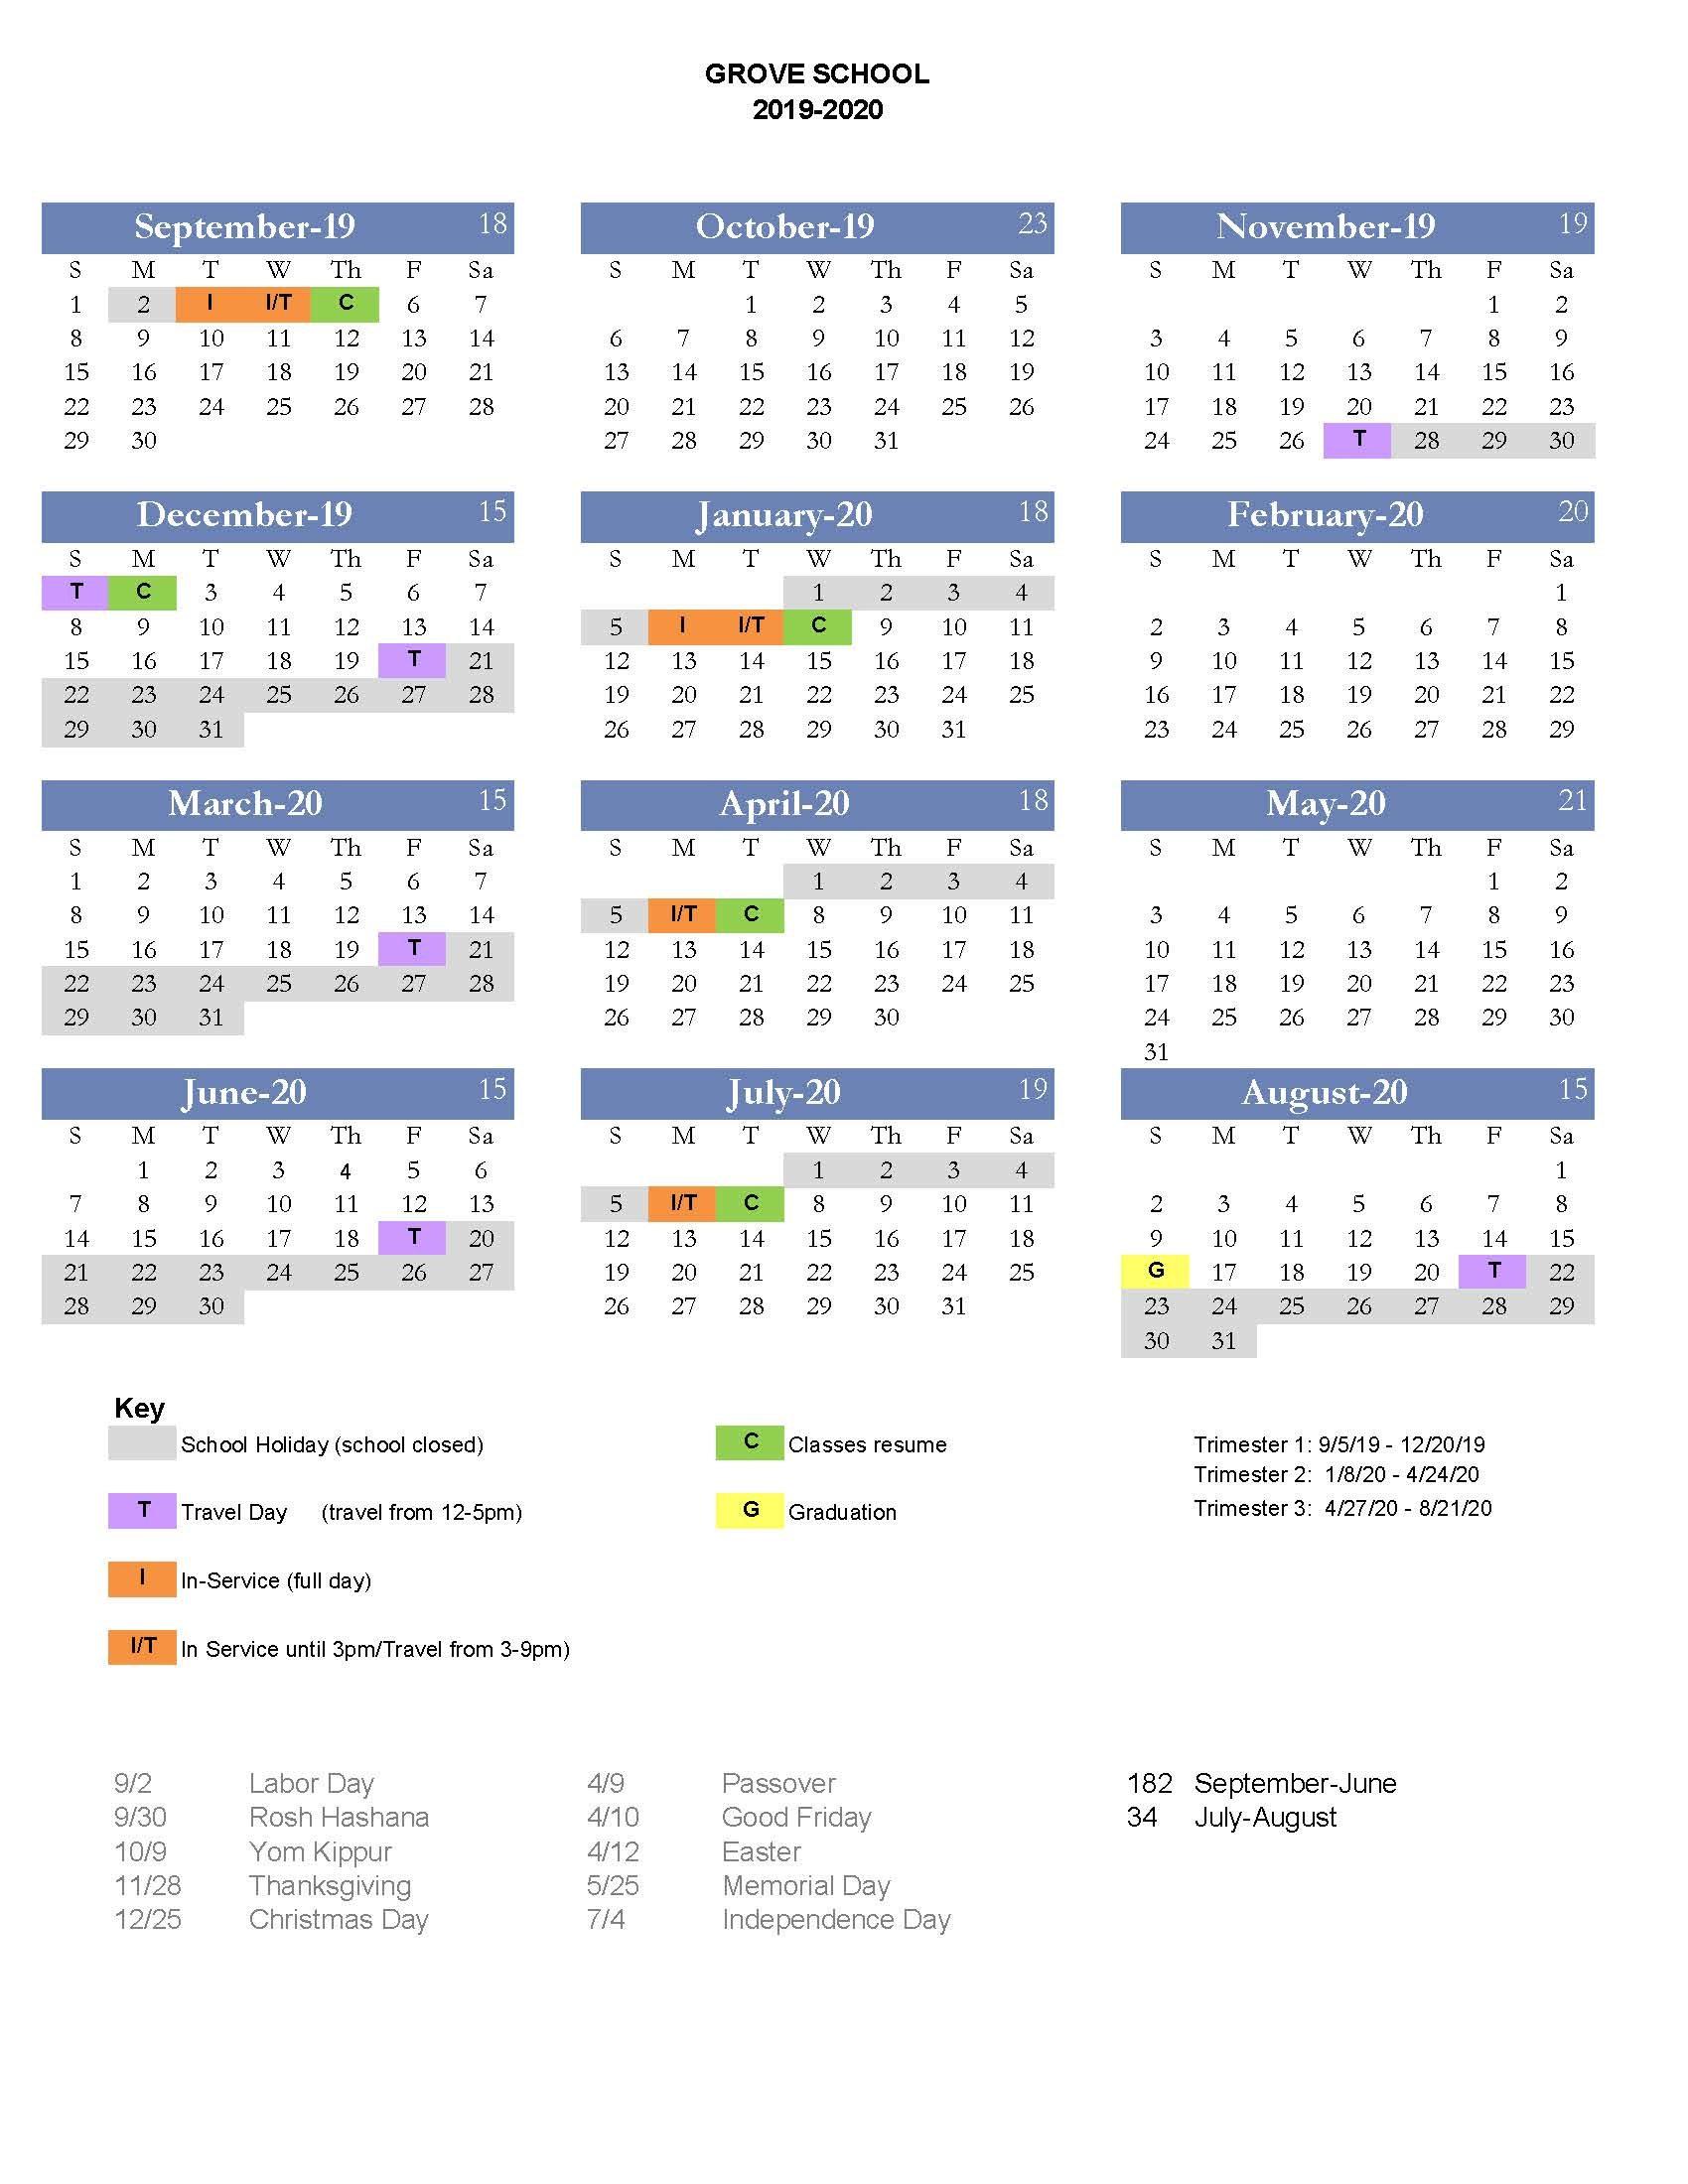 2019 2020 Calendar – Grove School With Regard To Johnson And Wales 2021 2020 Calendar